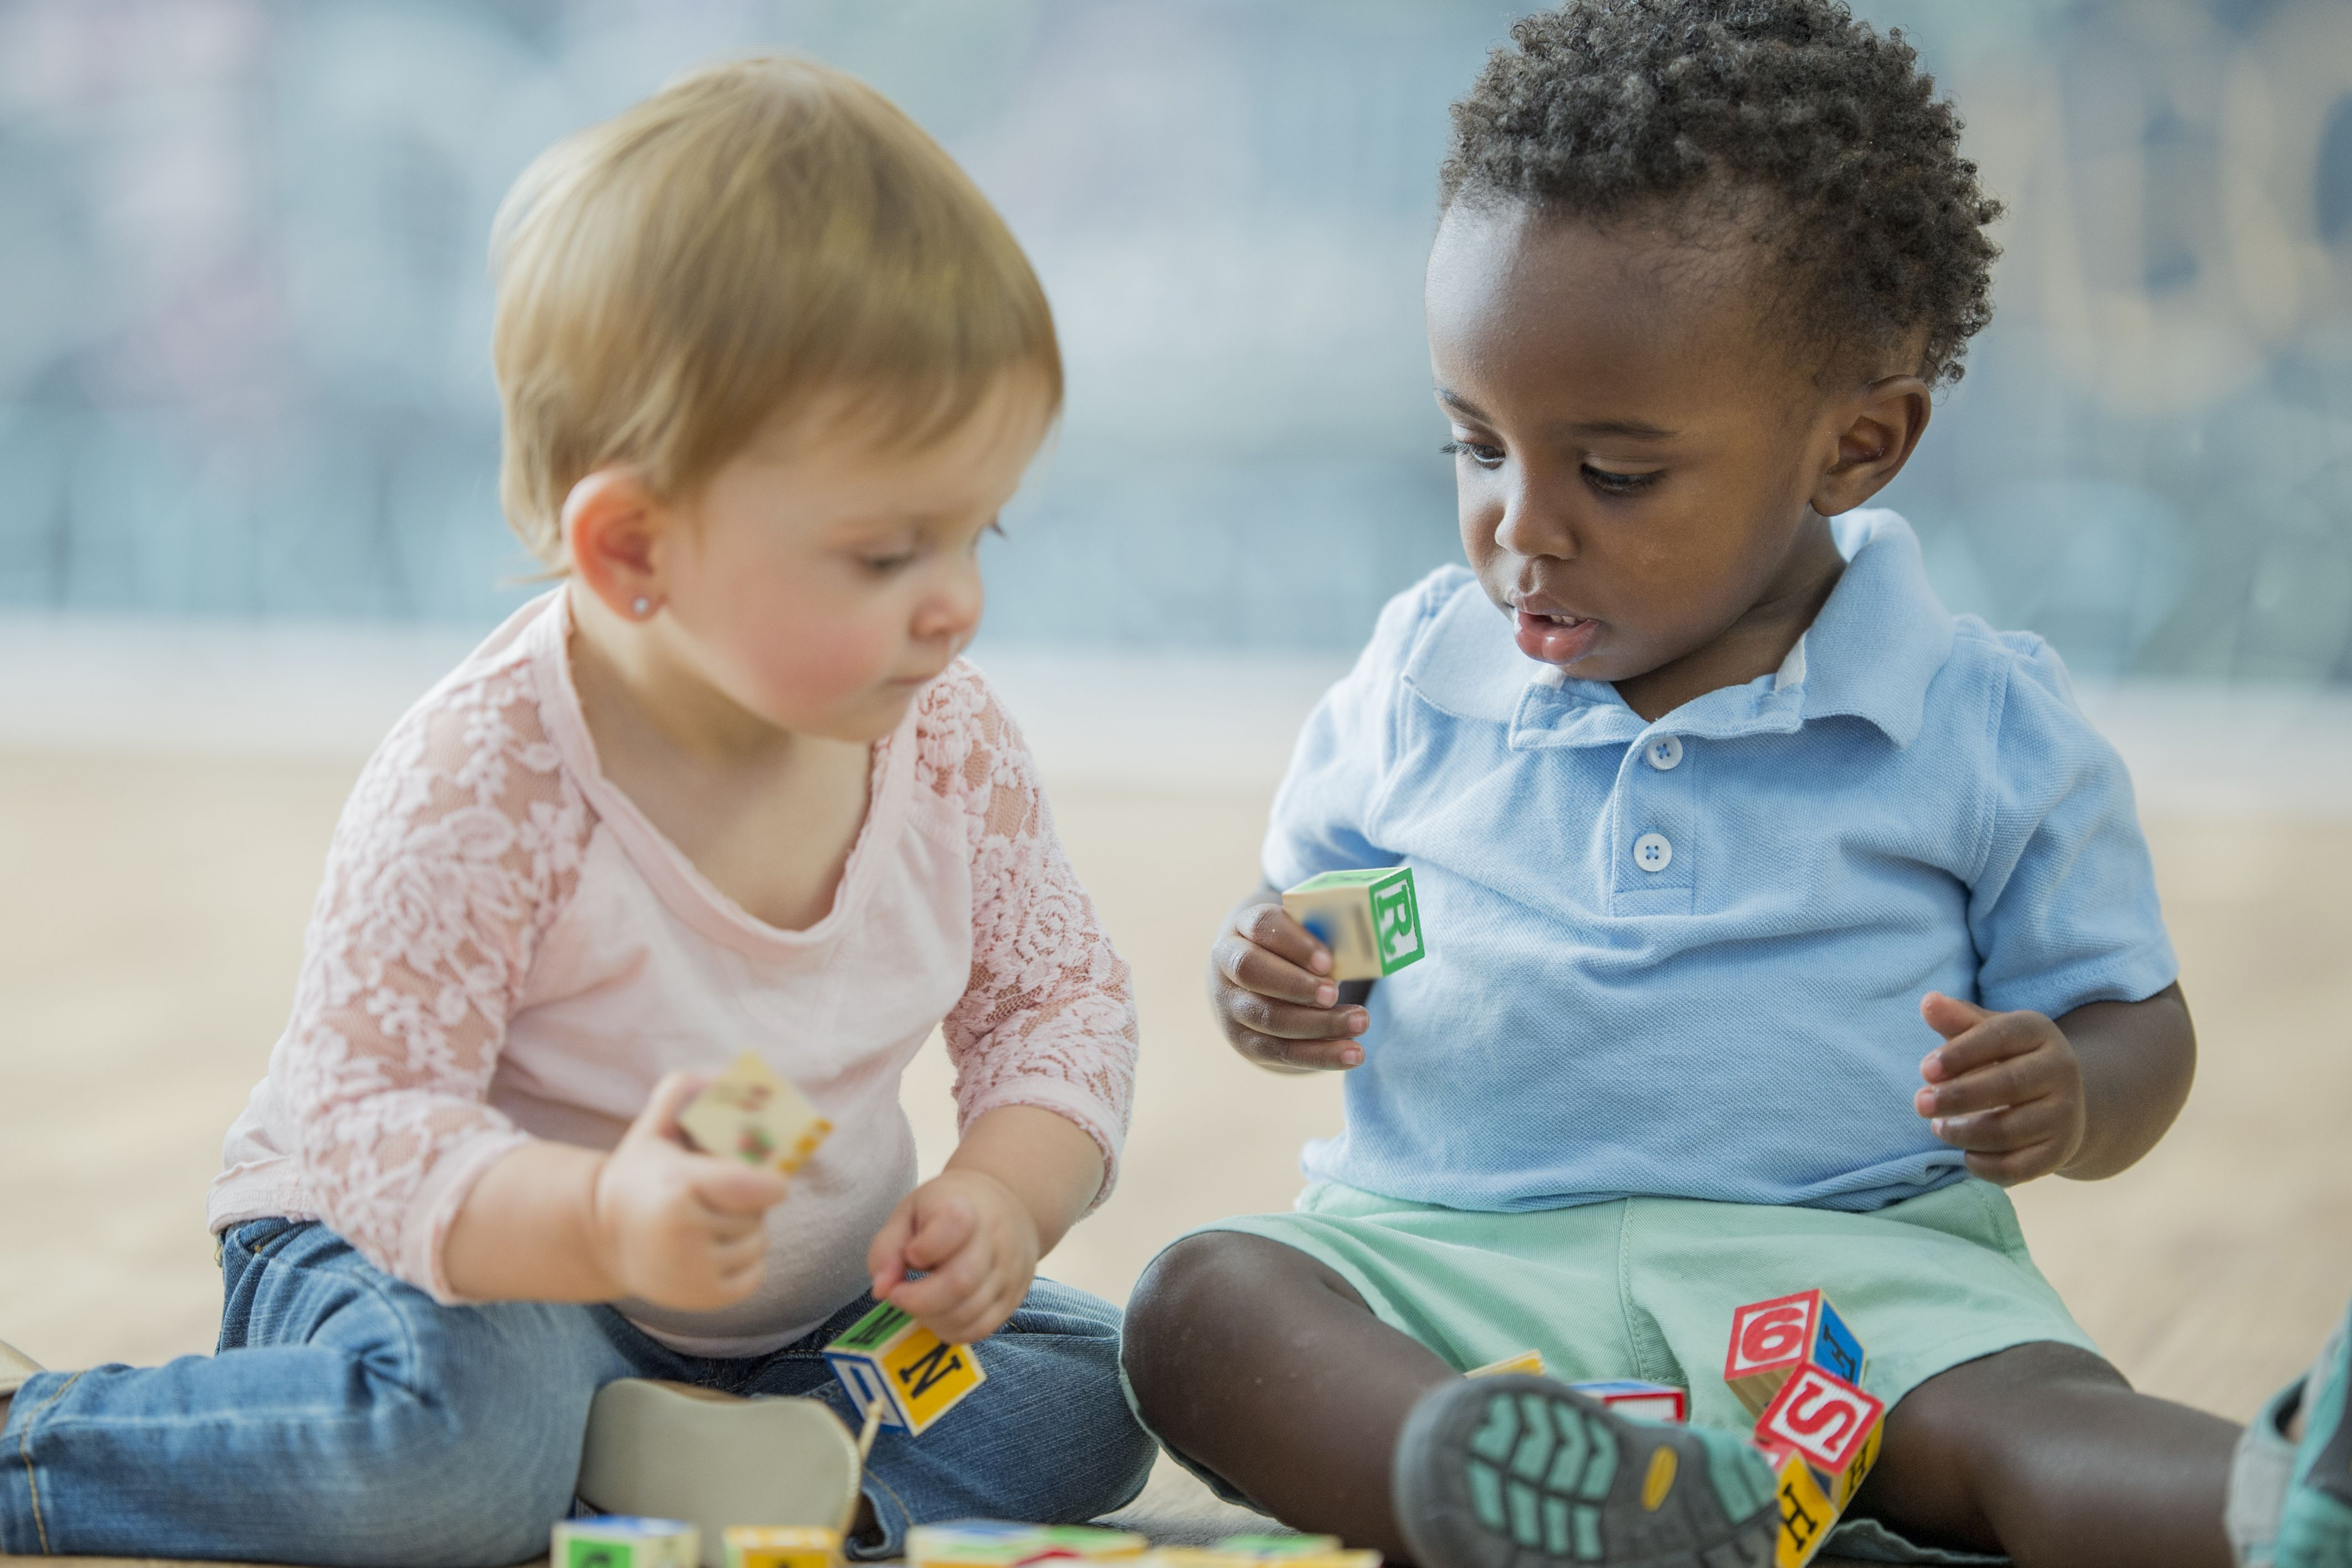 20 Unisex Names - Gender Neutral Names for Boys and Girls